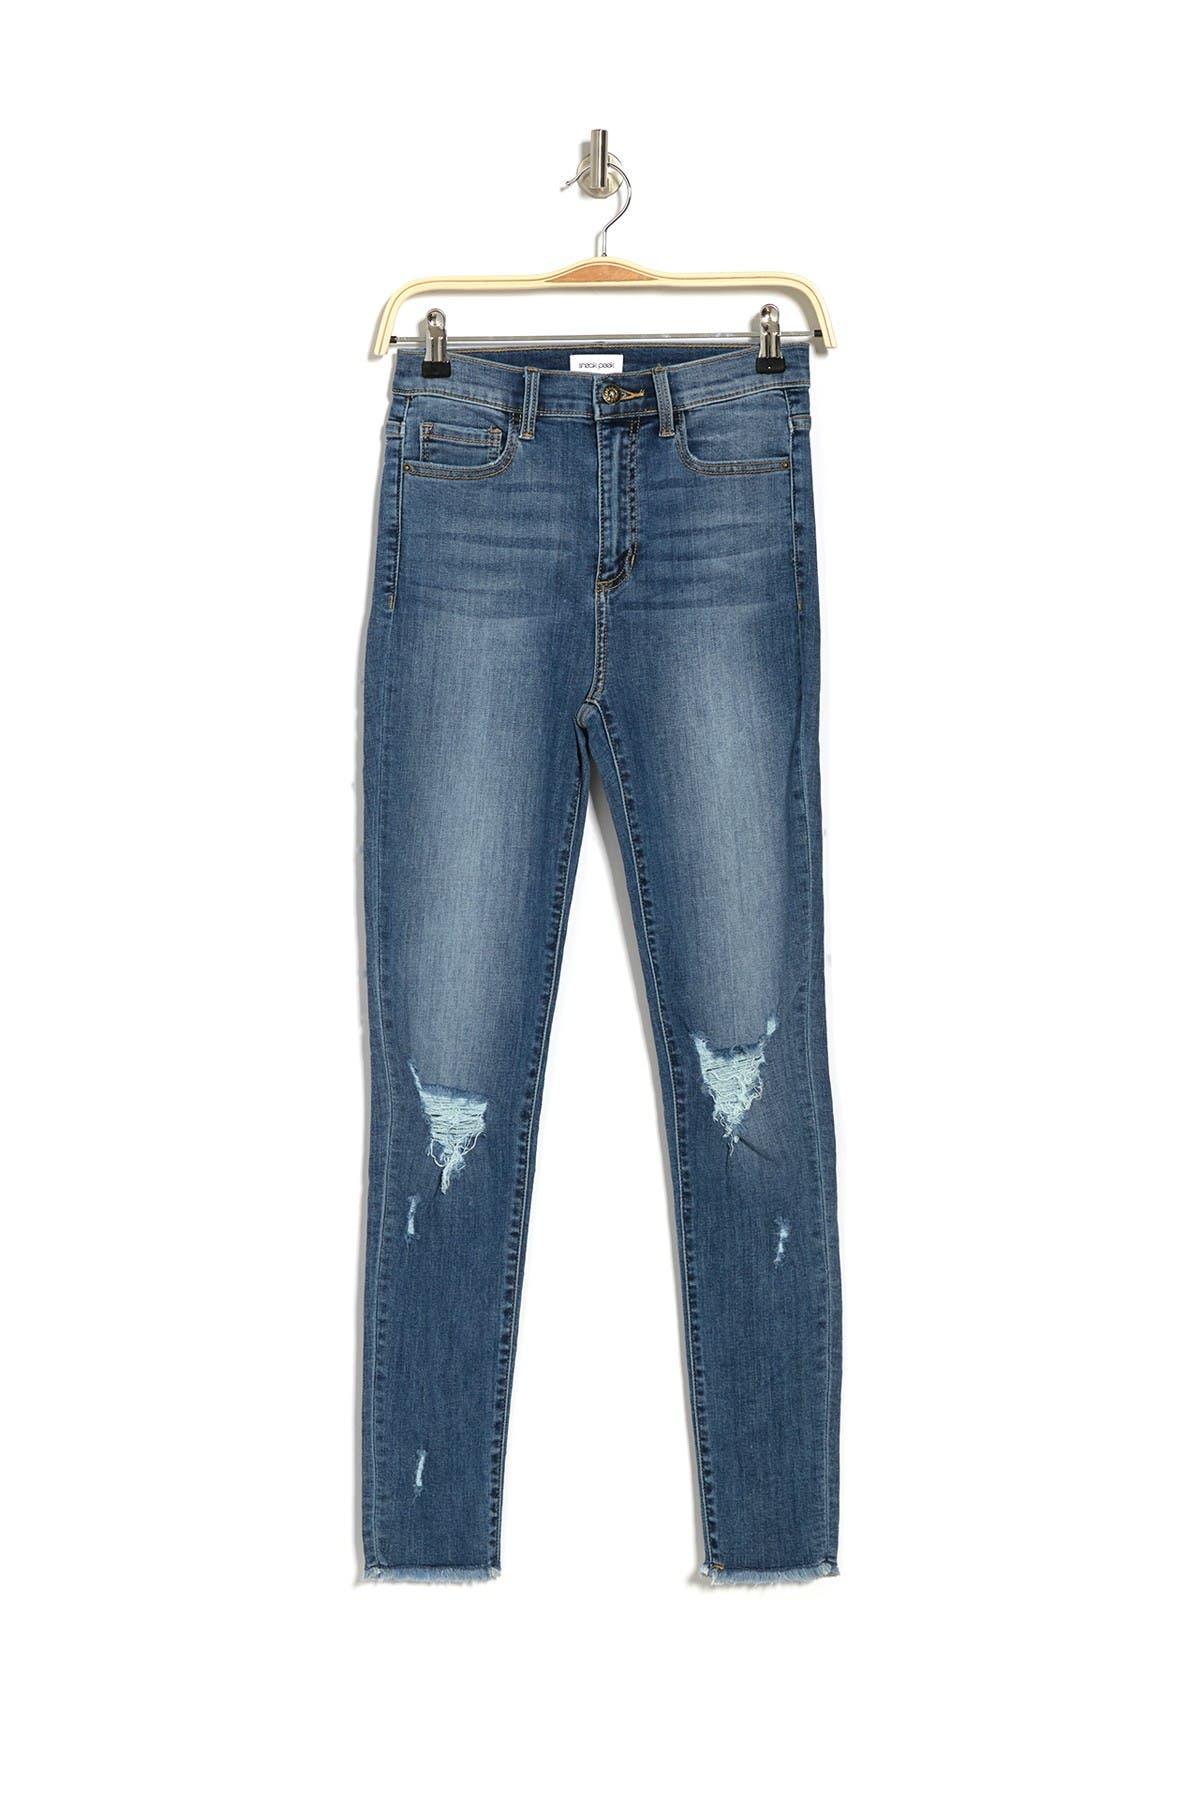 Image of Sneak Peek Denim Distressed High Rise Skinny Jeans